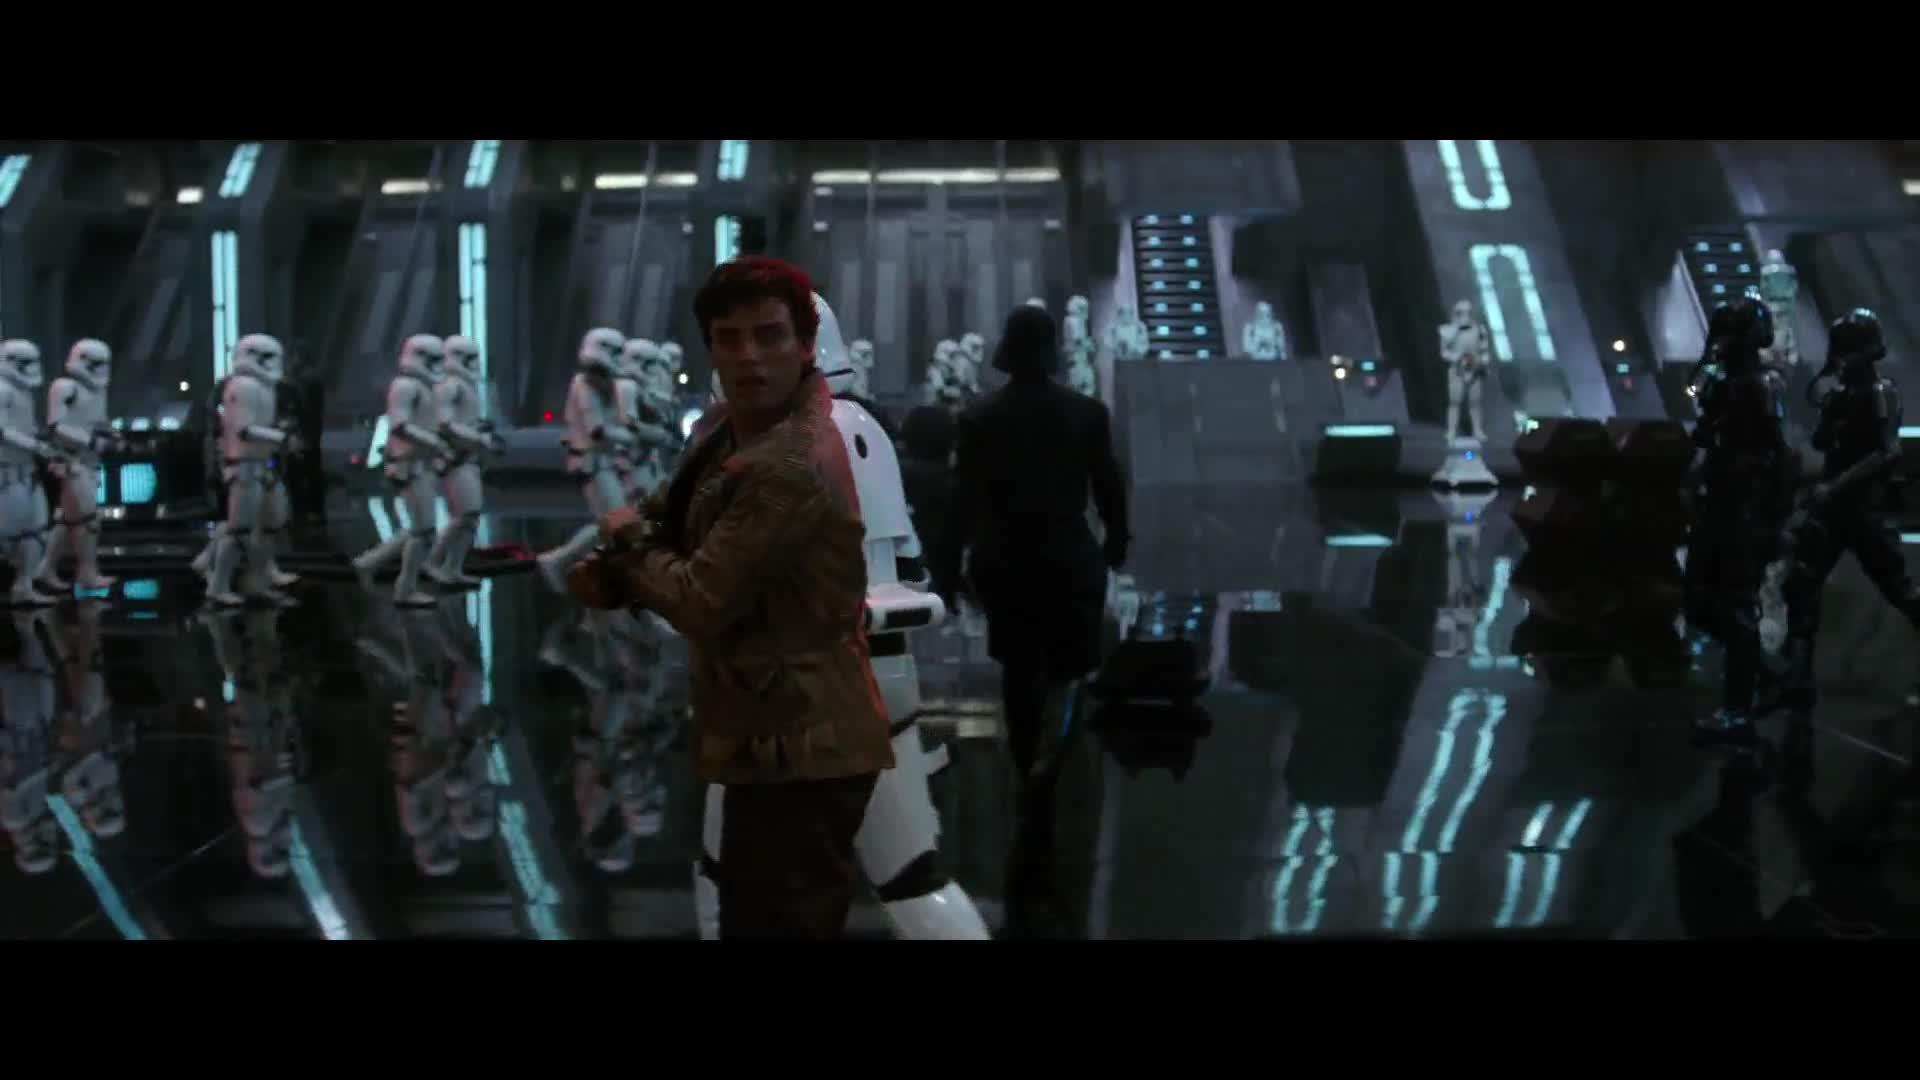 Star Wars Episode VII The Force Awakens สตาร์ วอร์ส เอพพิโซด 7 (2015)